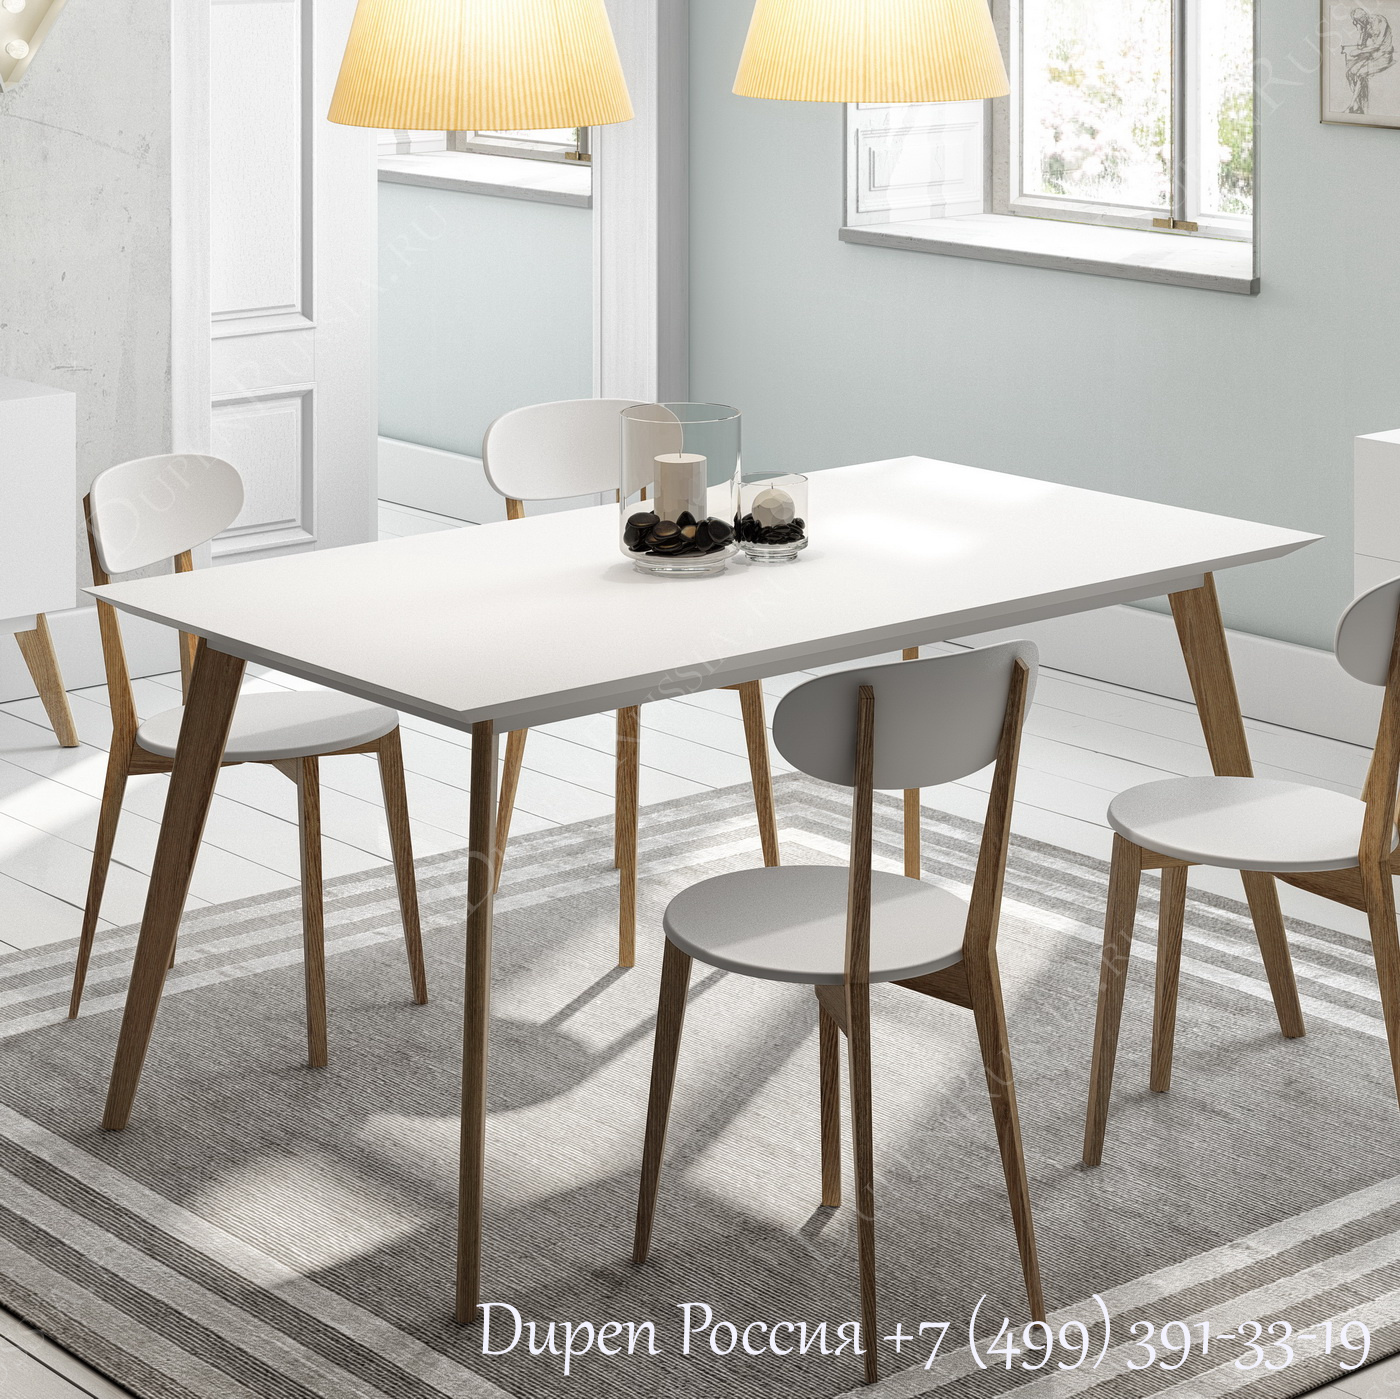 Обеденный стол DUPEN DT-900 Белый